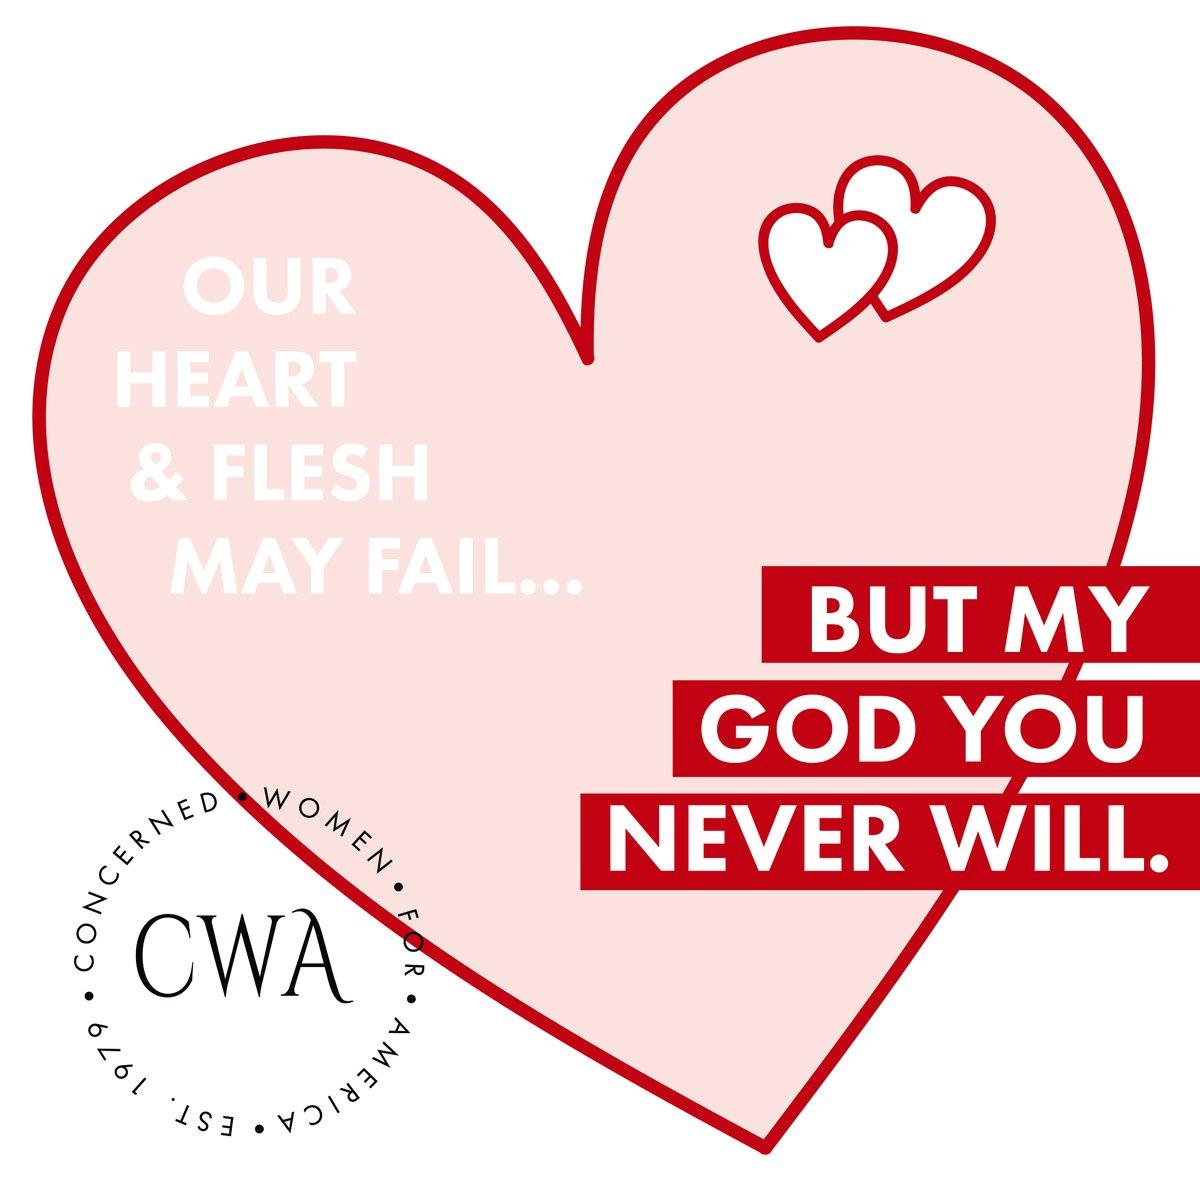 CWA LAC (@CWforA) on Twitter photo 01/04/2020 13:05:09